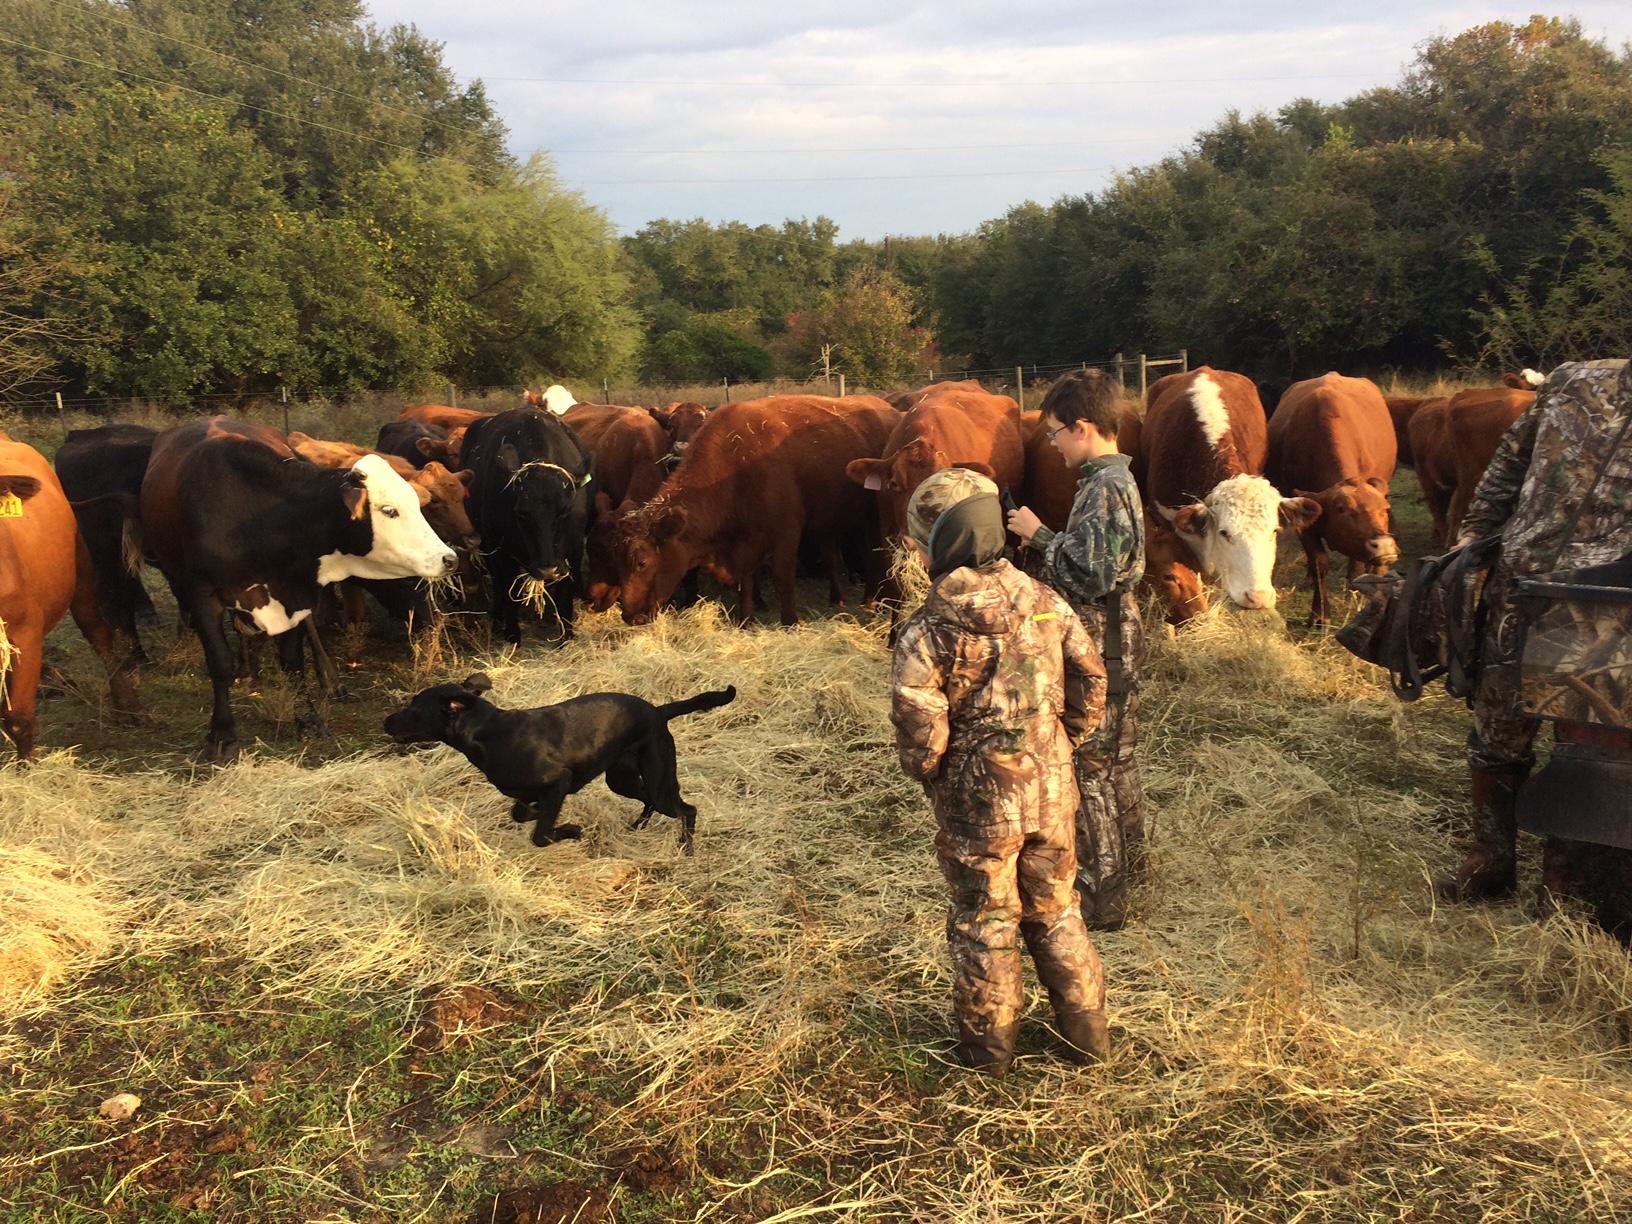 Jolie Vue Farms - Grass fed cows.